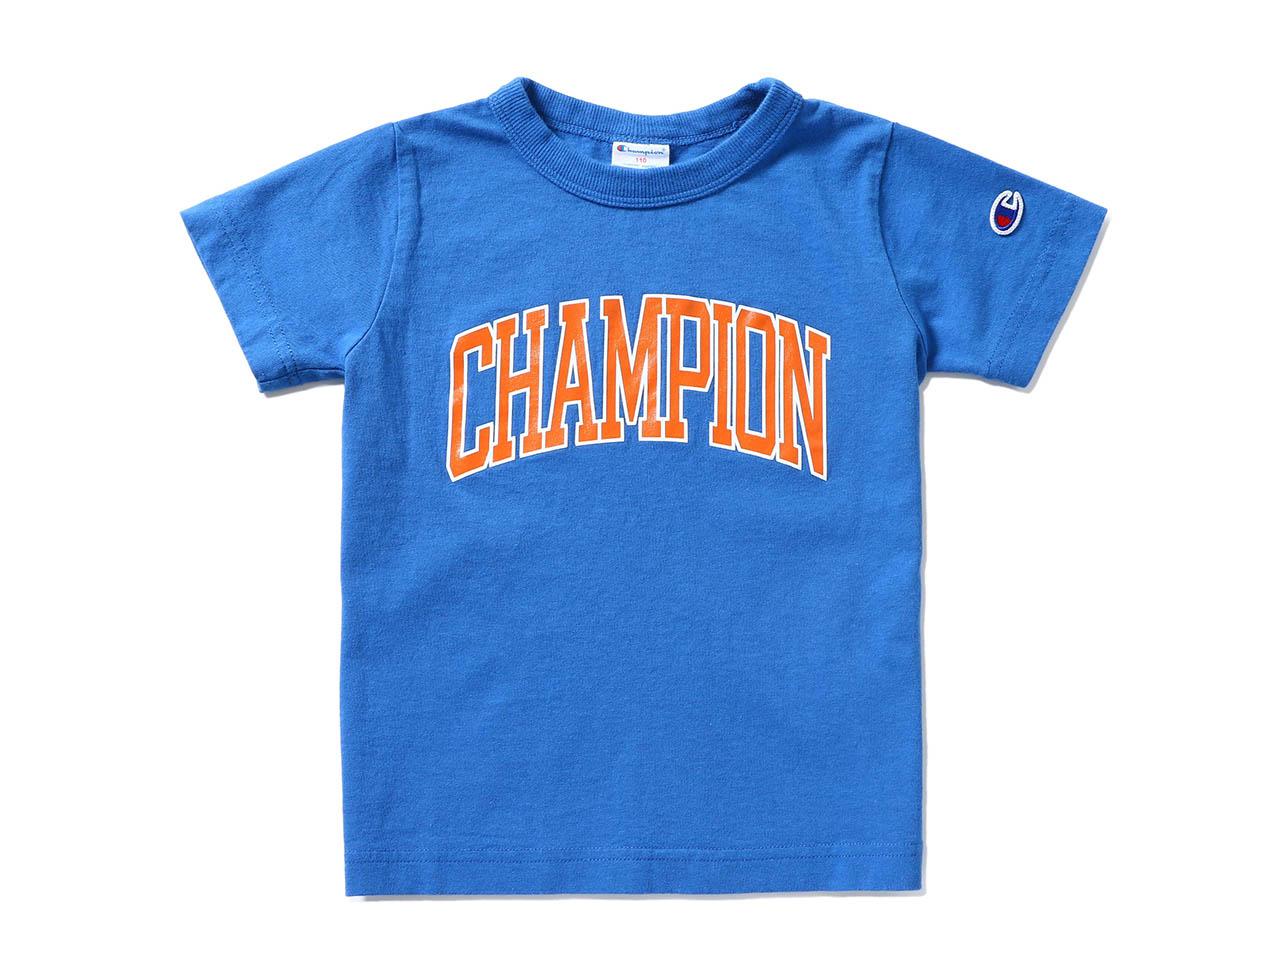 【30%OFF】Champion KIDS PRINT T-SHIRT - CS6462